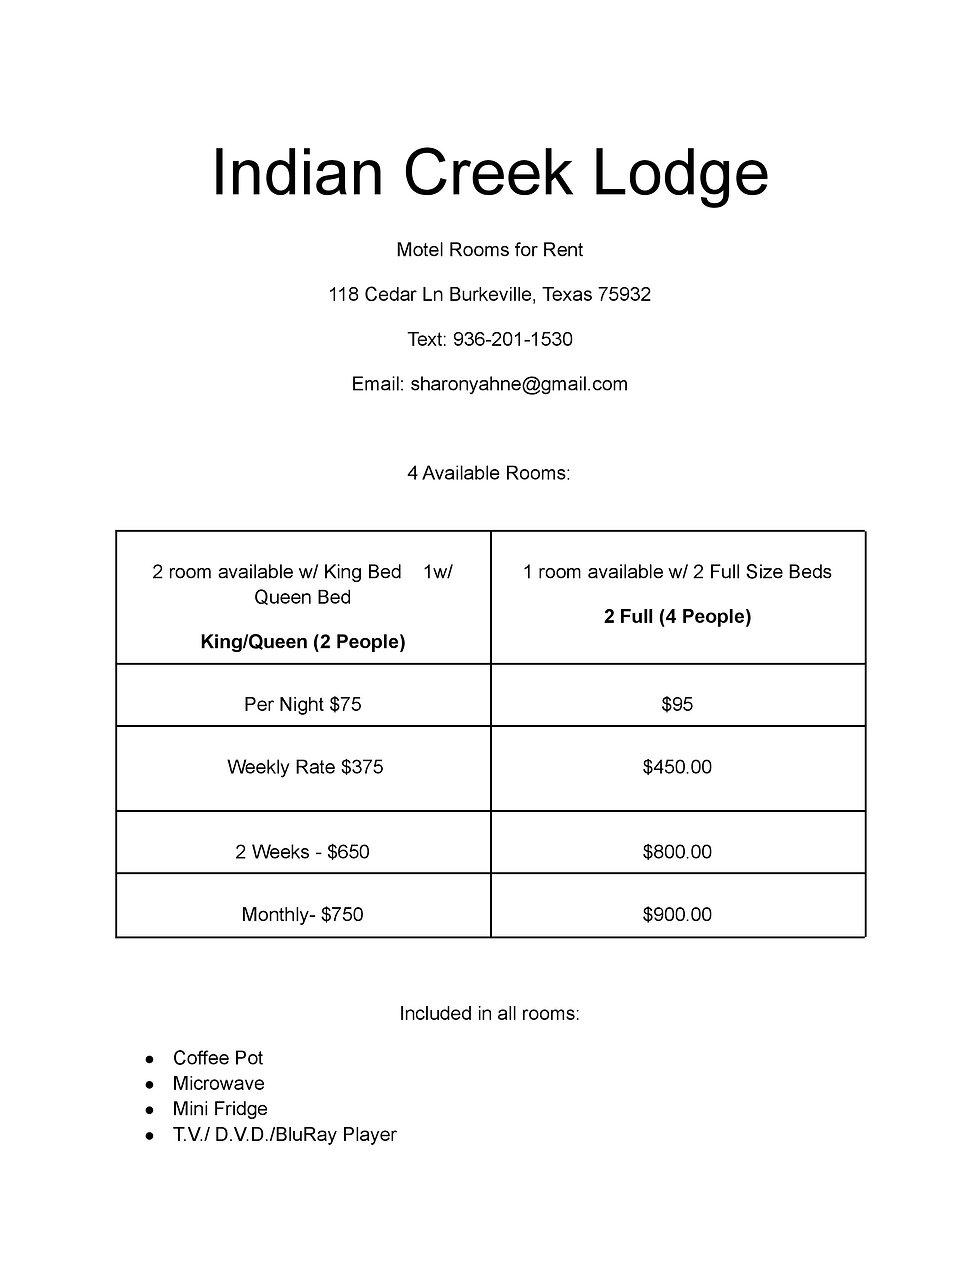 Indian Creek Lodge-page-001.jpg